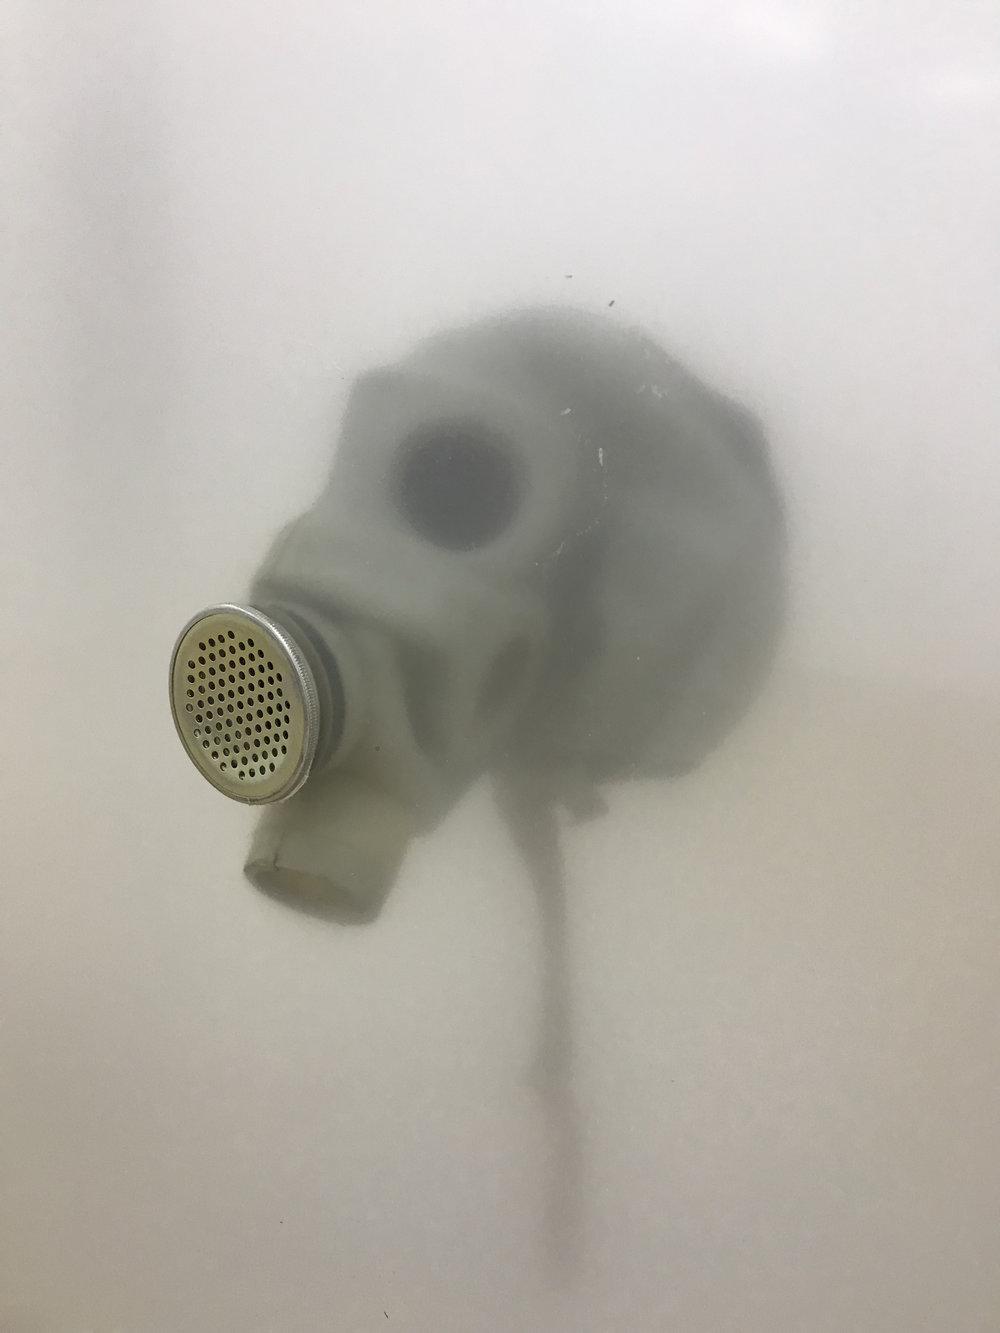 Vladislav Markov  Untitled , 2018 (detail) library shelves, Plexiglas, polyurethane engine cast, gas mask, fog machine,  plastic hose, self-adhesive carpet protector film 84 x 84 x 24 inches (213 x 213 x 61 cm) (VM3)